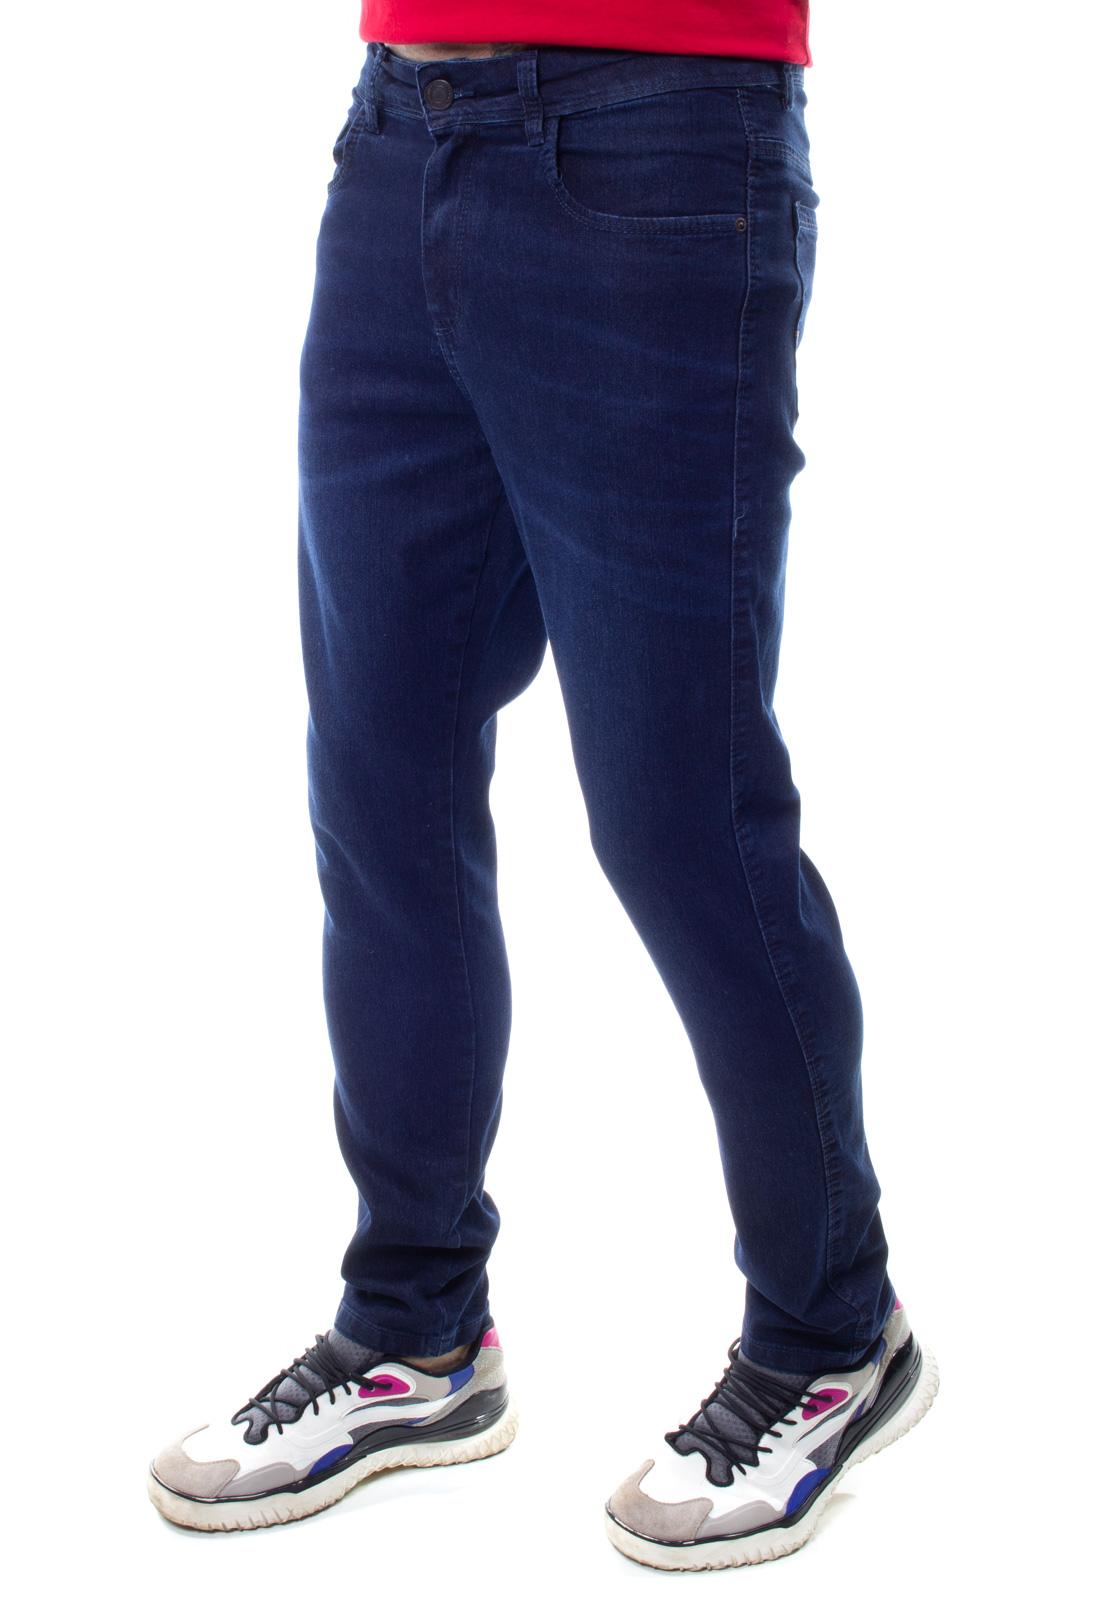 Calça Confort Jeans Masculina Crocker - 48171  - CROCKER JEANS